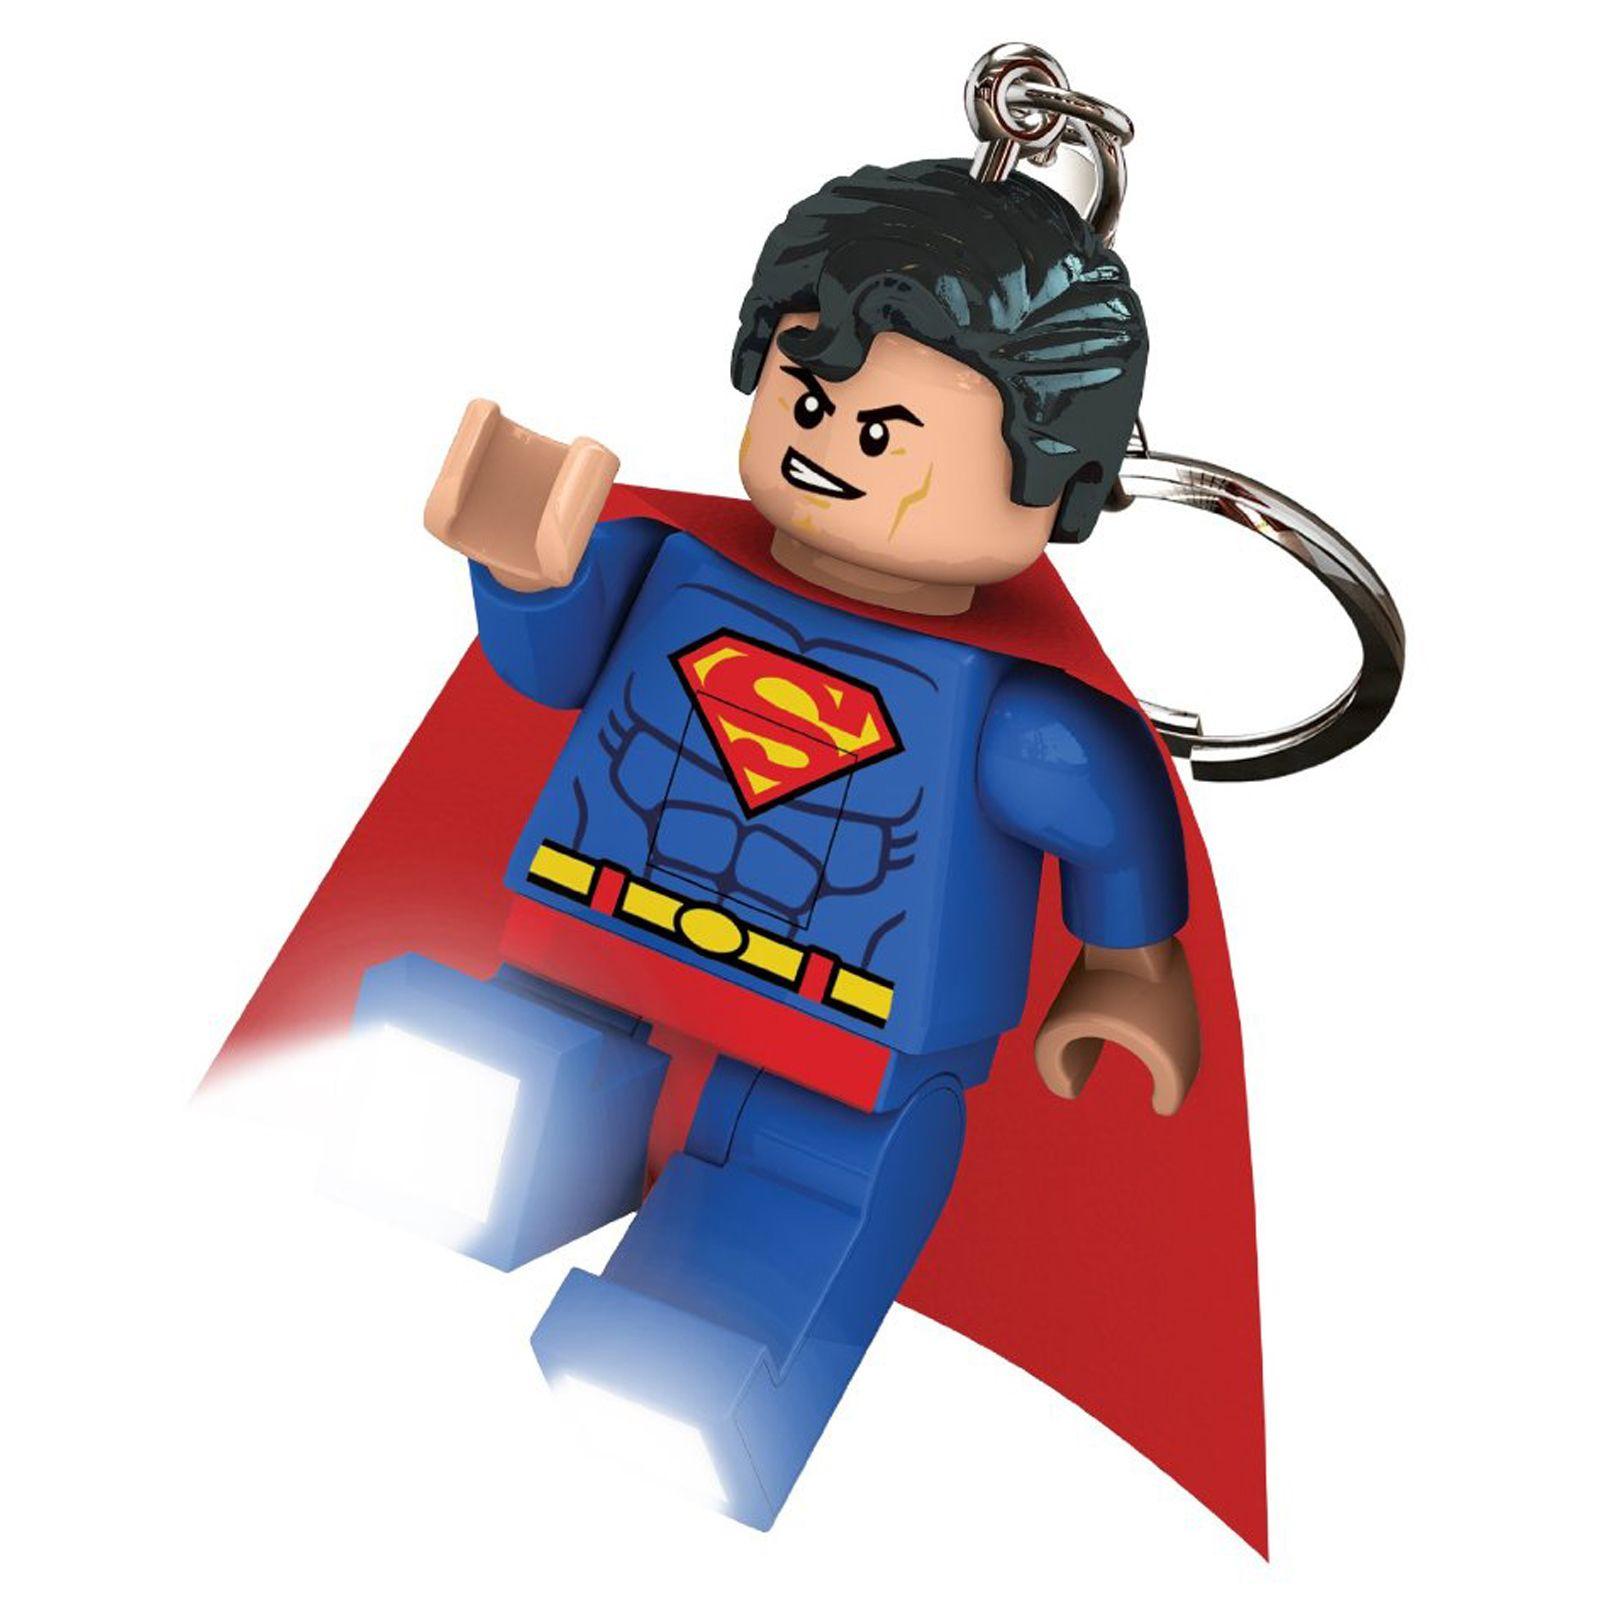 Details about LEGO DC SUPER HEROES SUPERMAN LED LITE KEYRING TORCH NEW ...